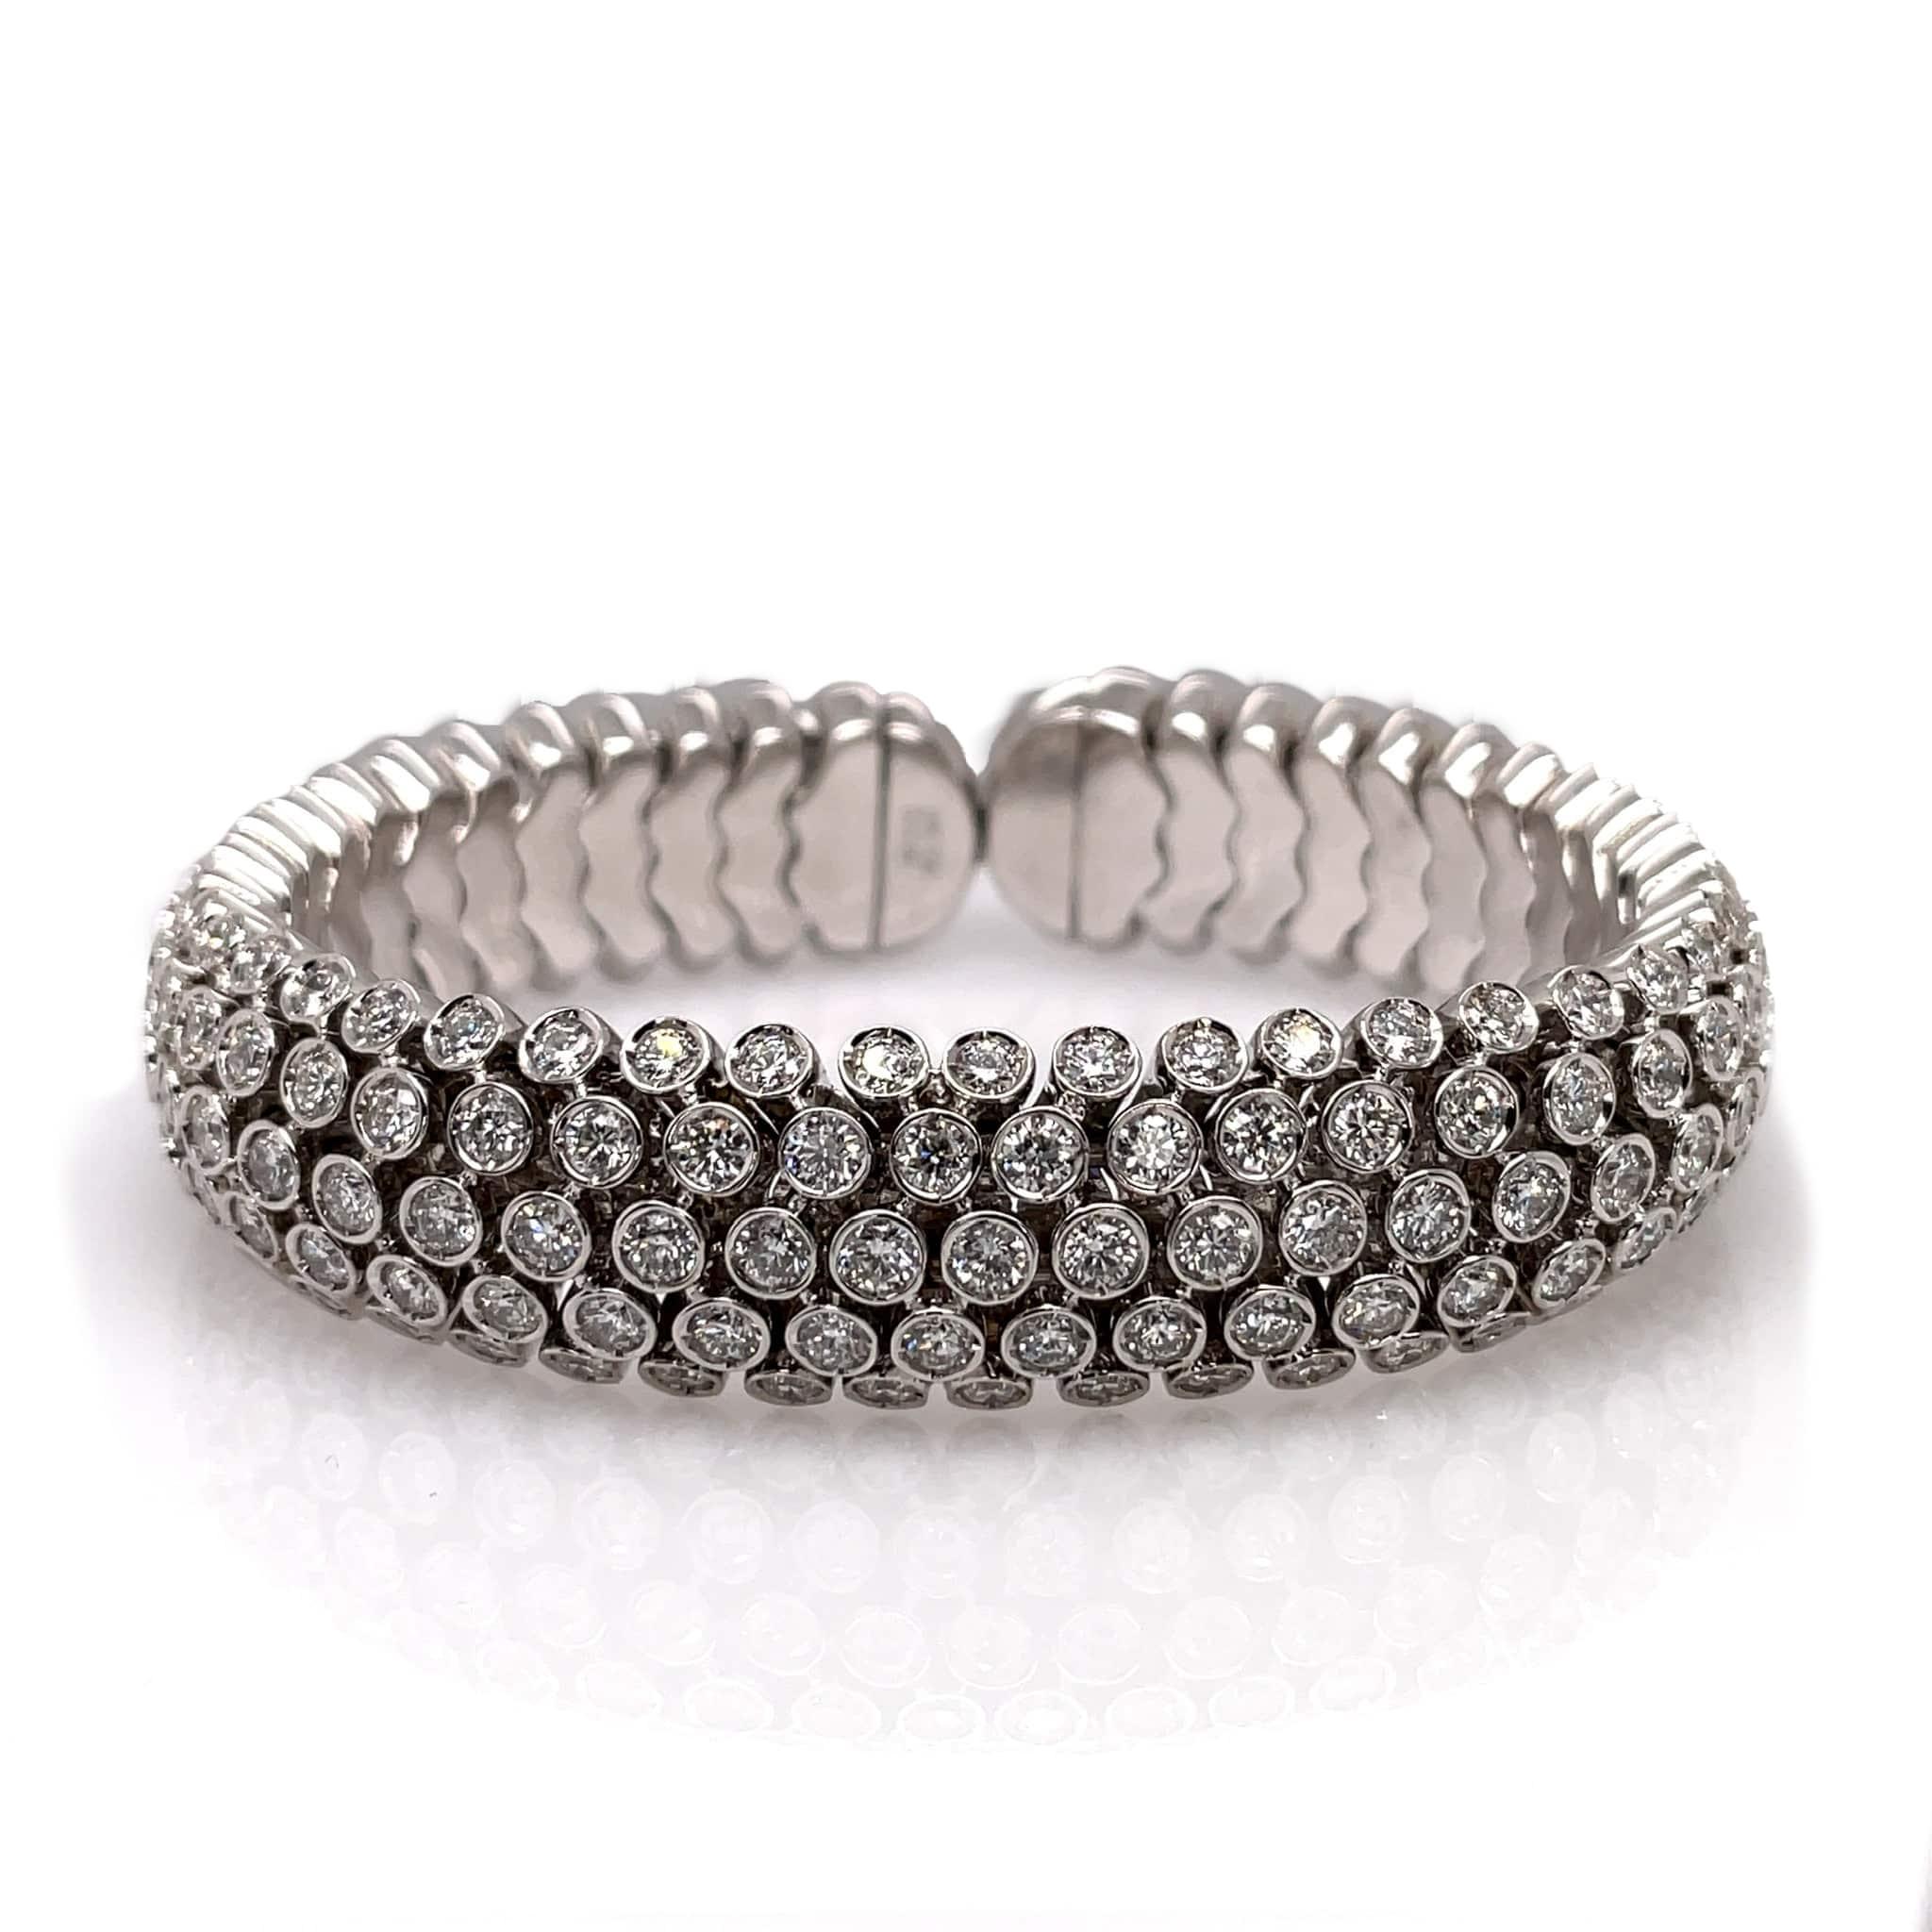 Bezel-set Diamond Bangle